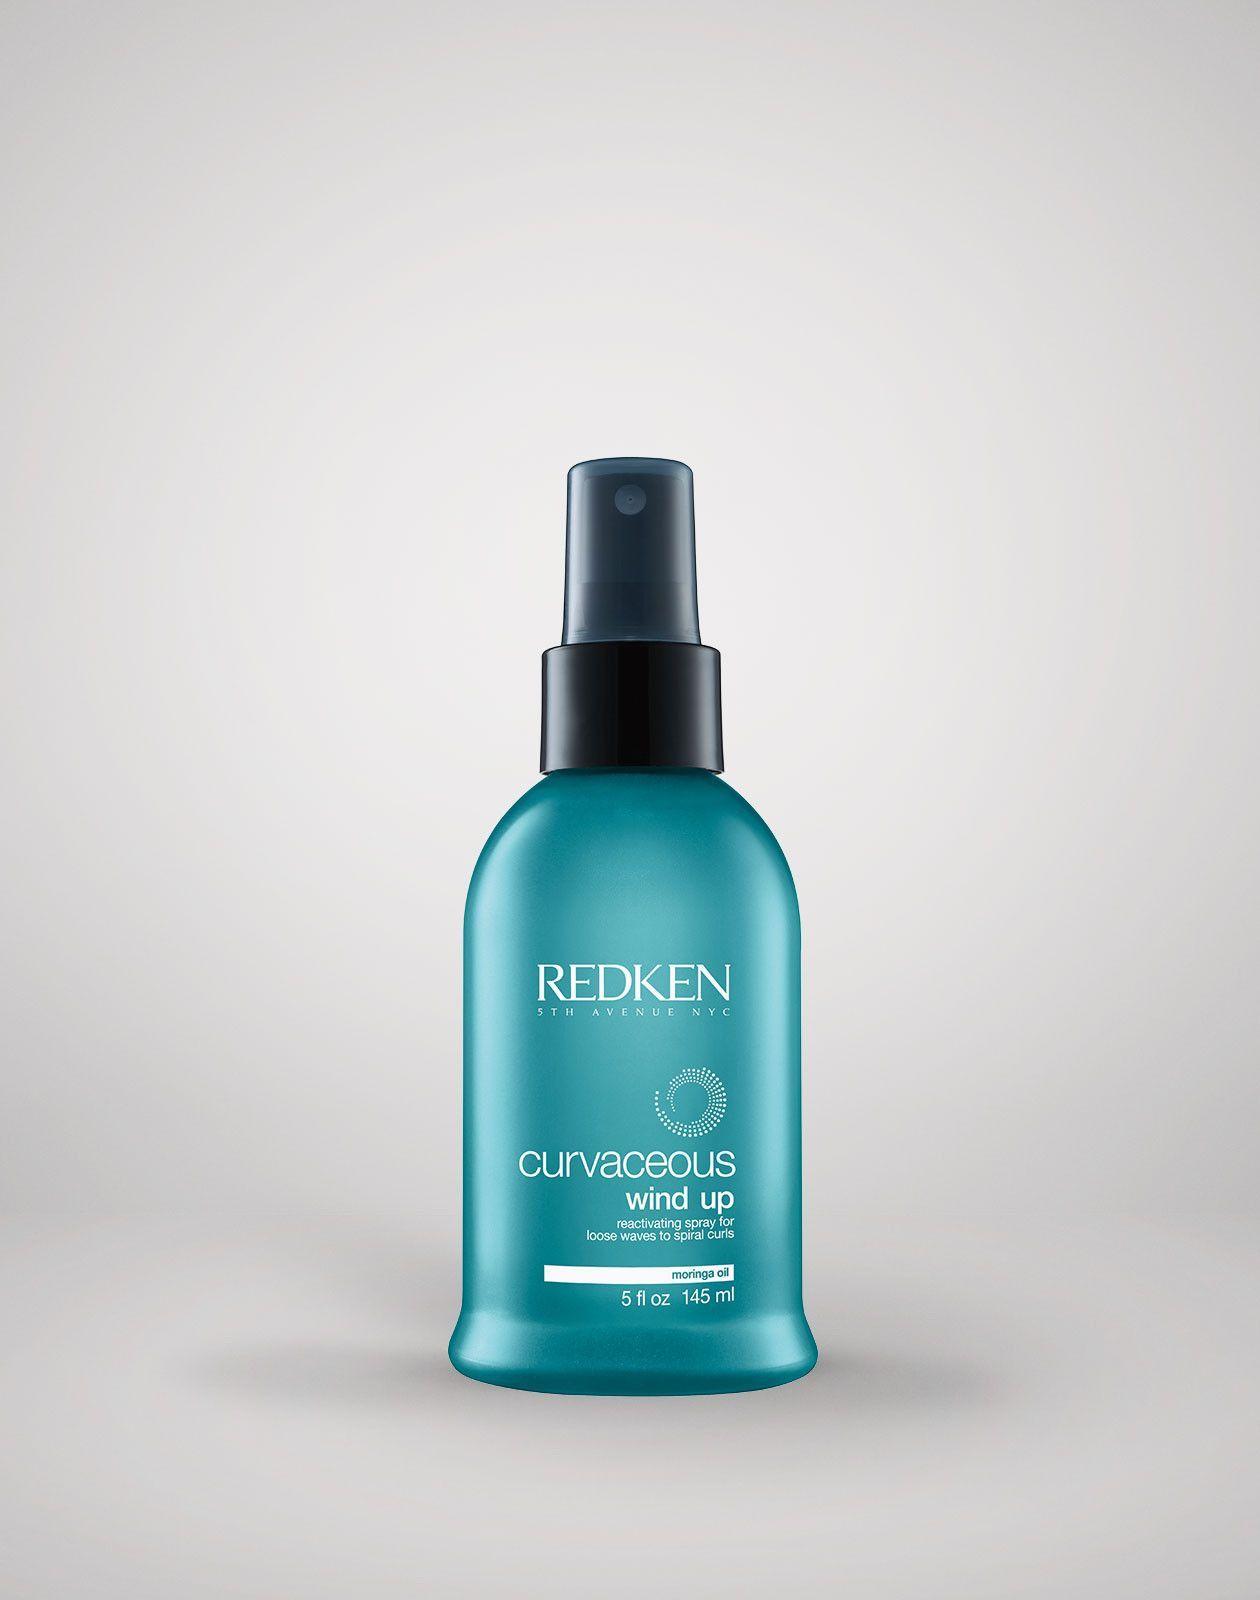 REDKEN Curvaceous Wind Up Reactivating Spray Redken